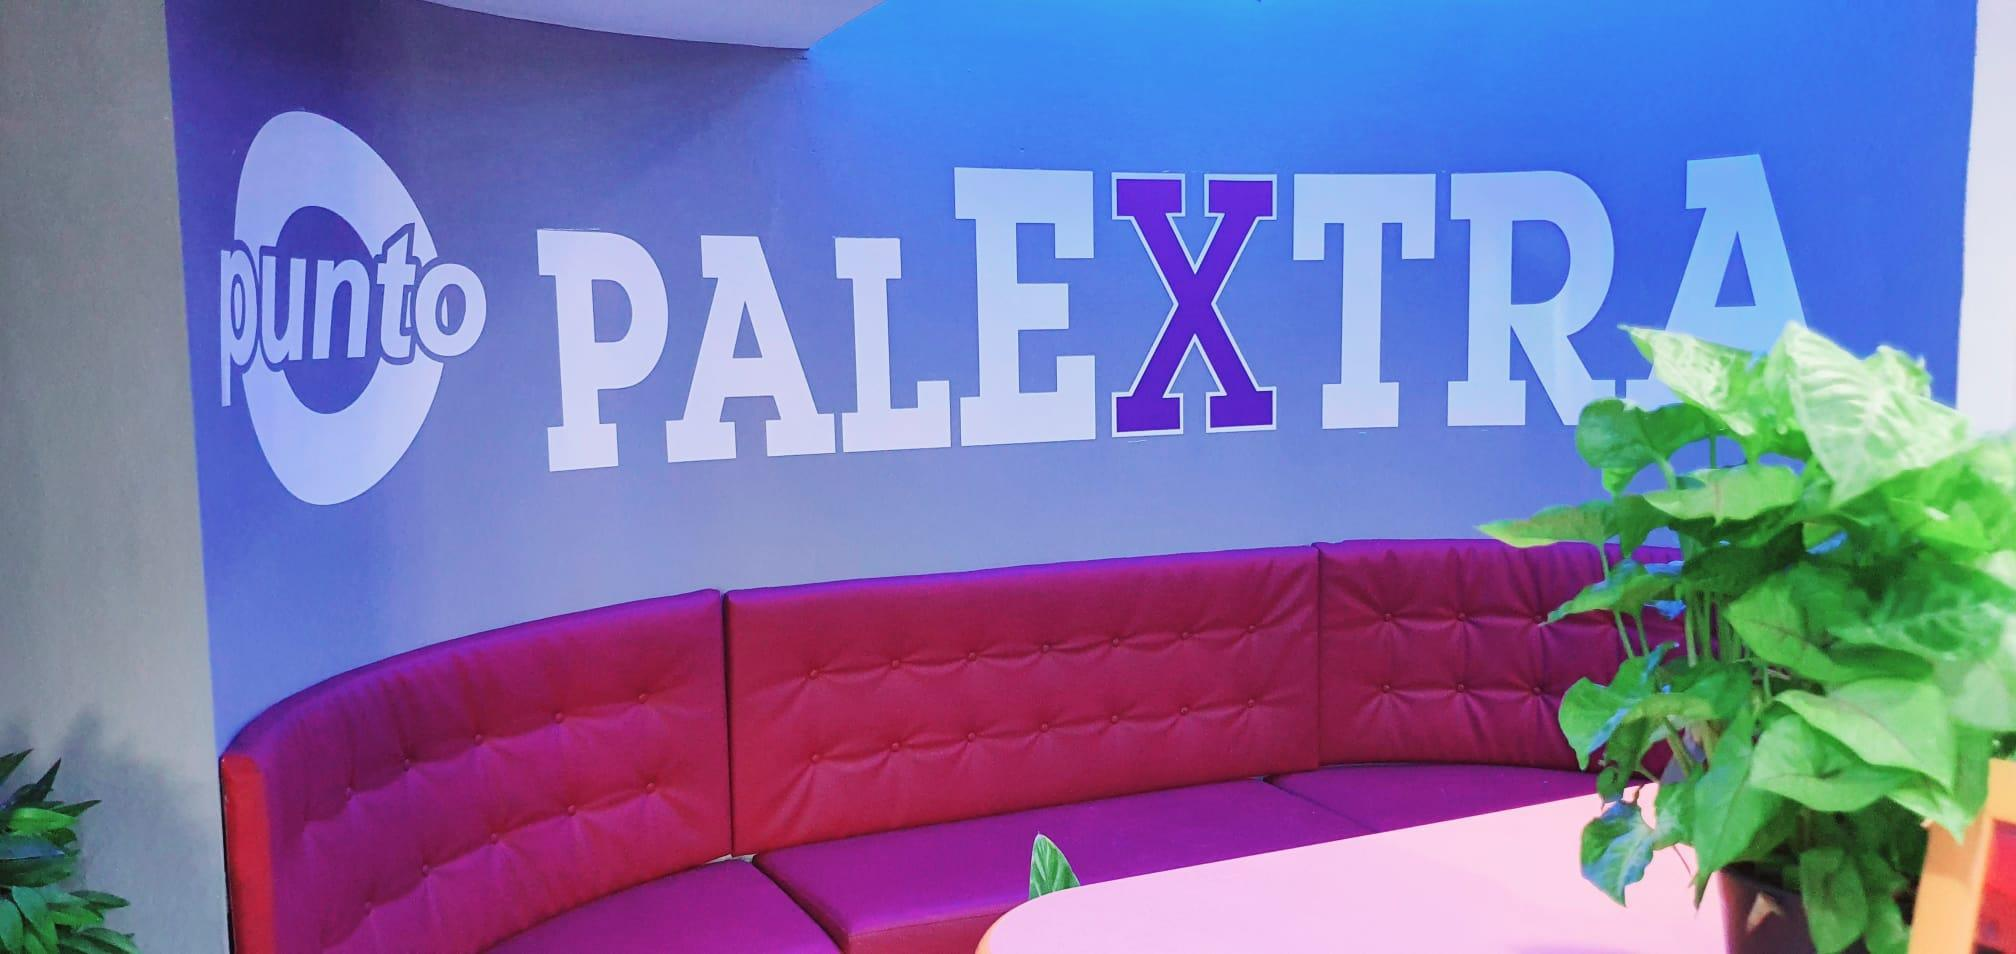 PuntoPalEXTRA10